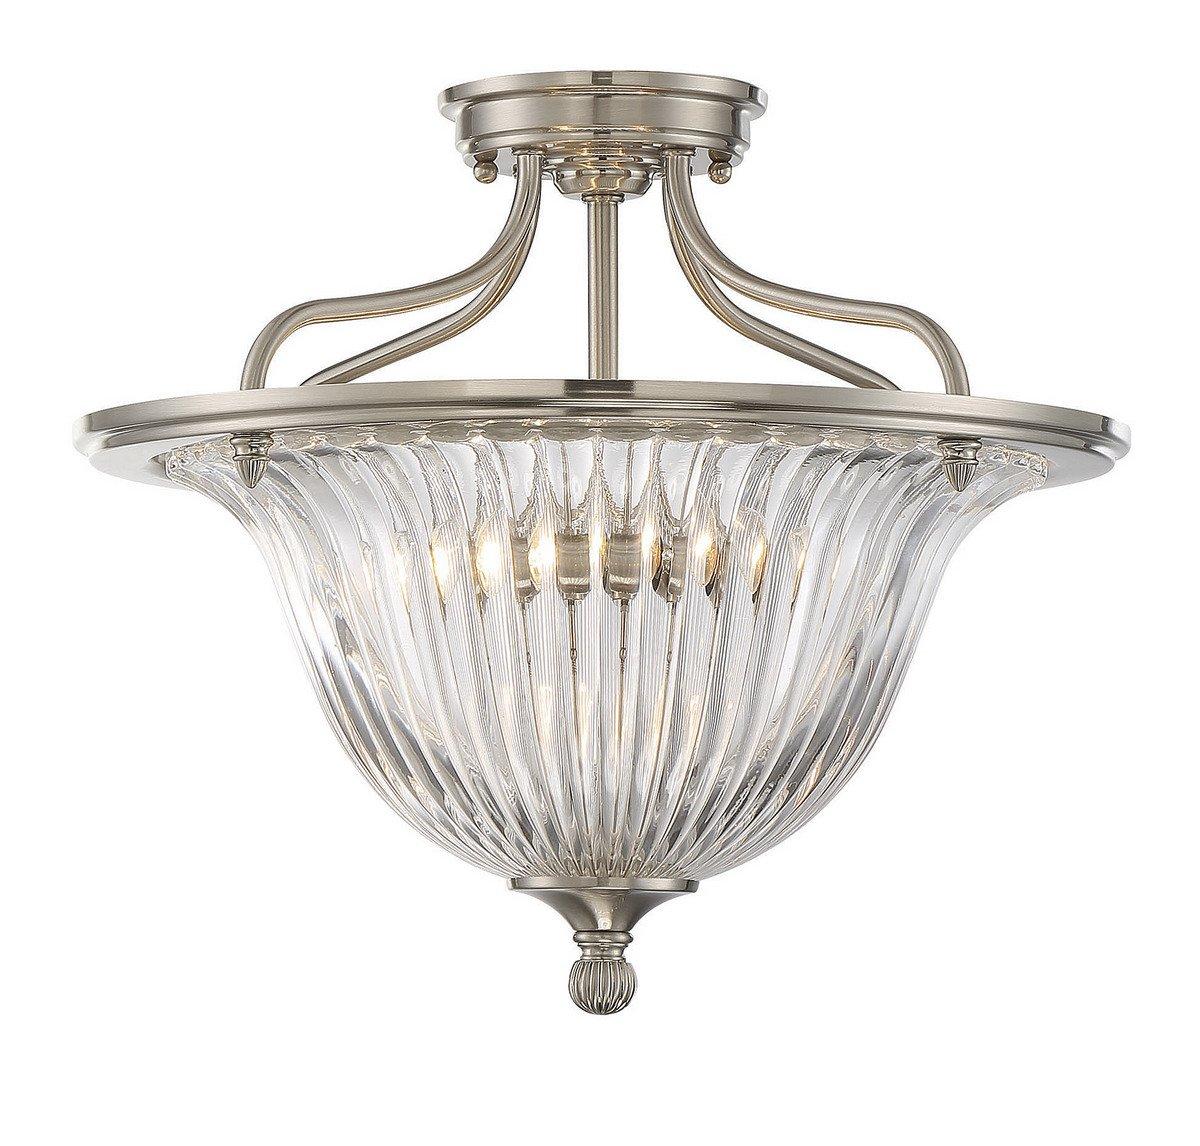 Savoy House Three Light Convertible Semi-Flush 6-151-3-SN